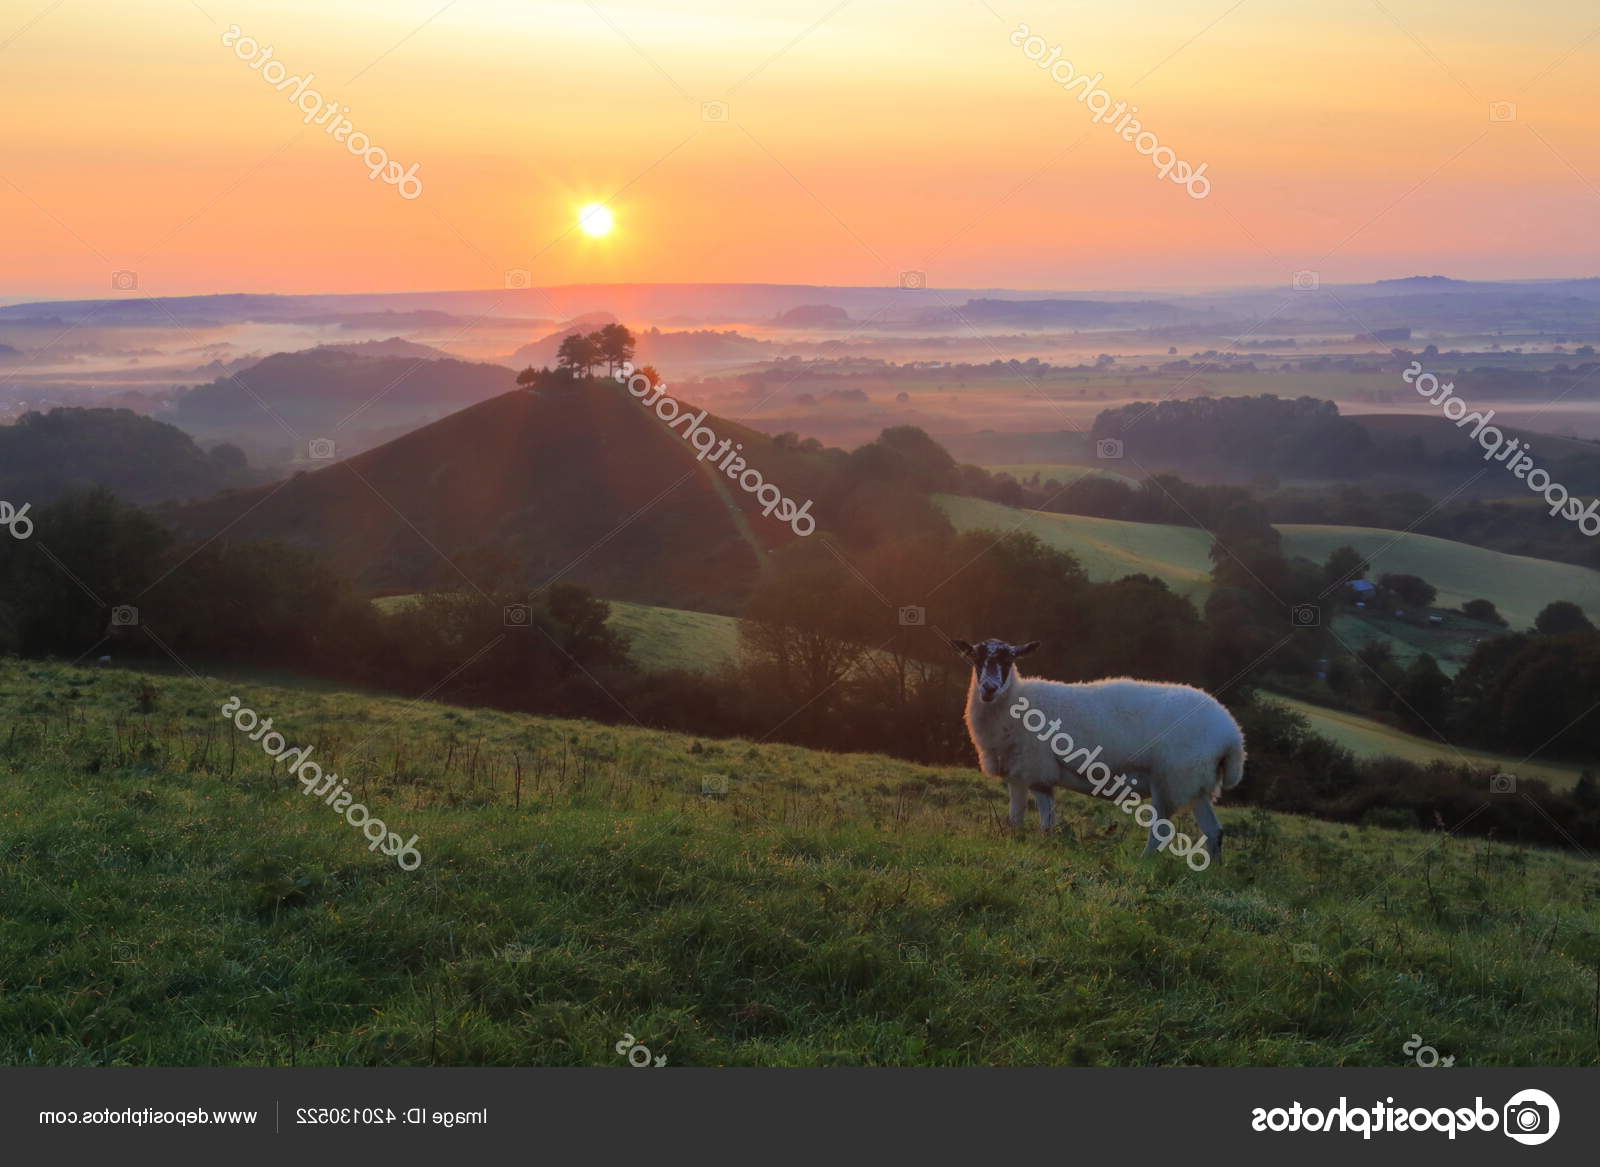 Domba Tanah Pertanian Dorset Saat Matahari Terbit — Stok inside Gambar Domba Dorset